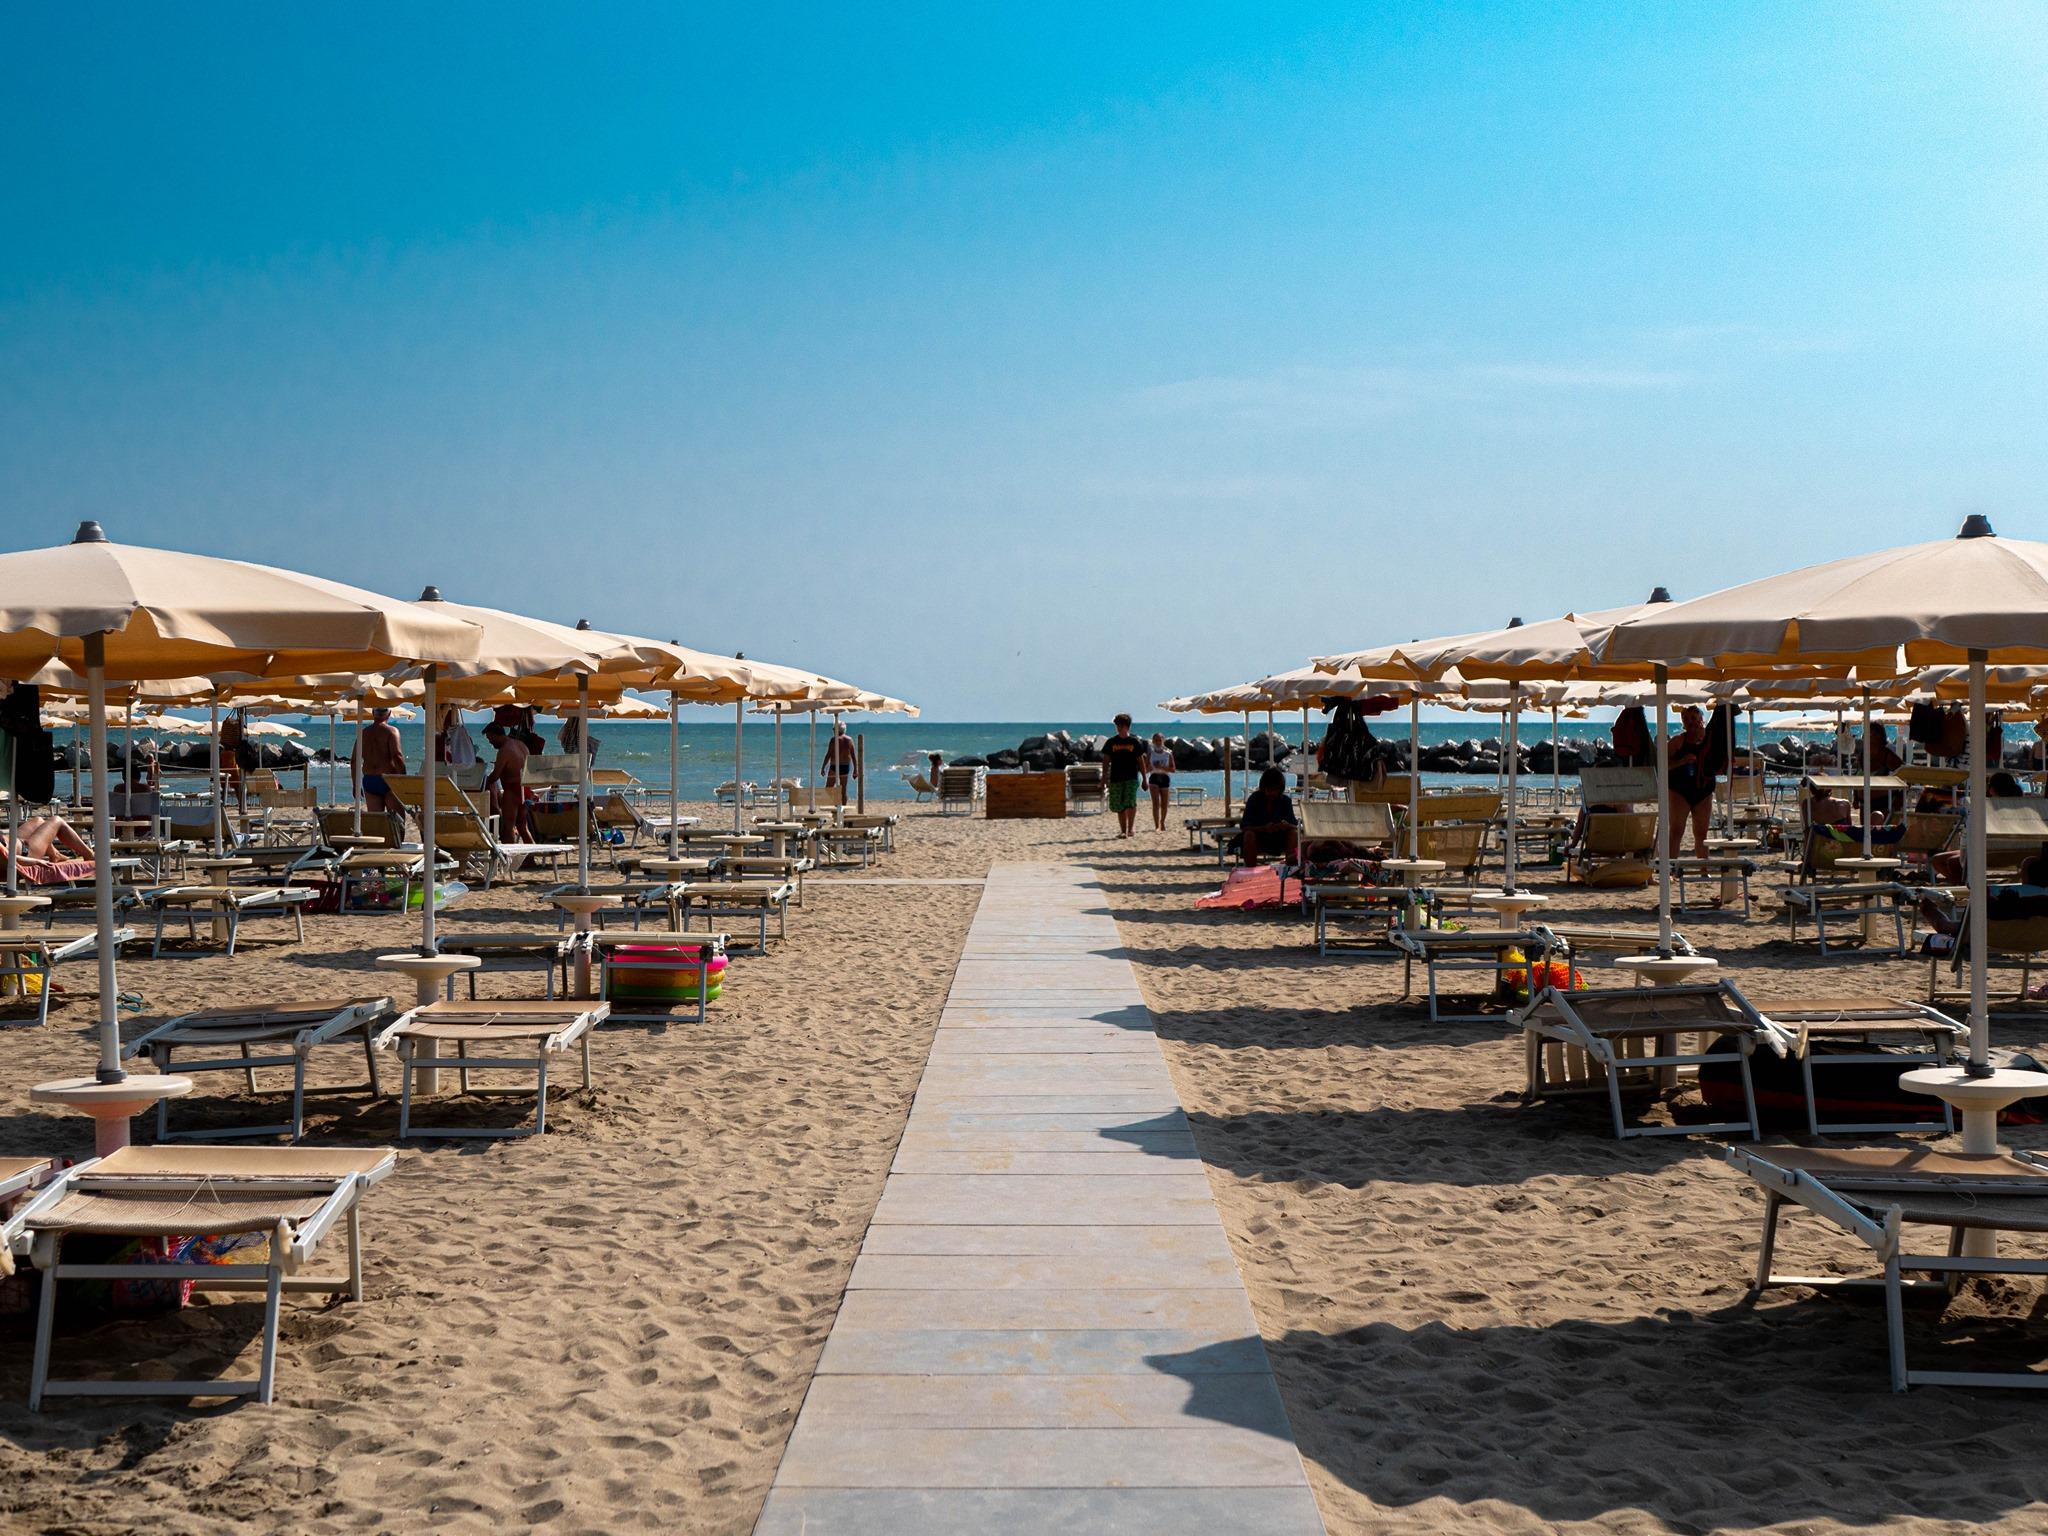 Gustofino Beach By Bagno Vanni